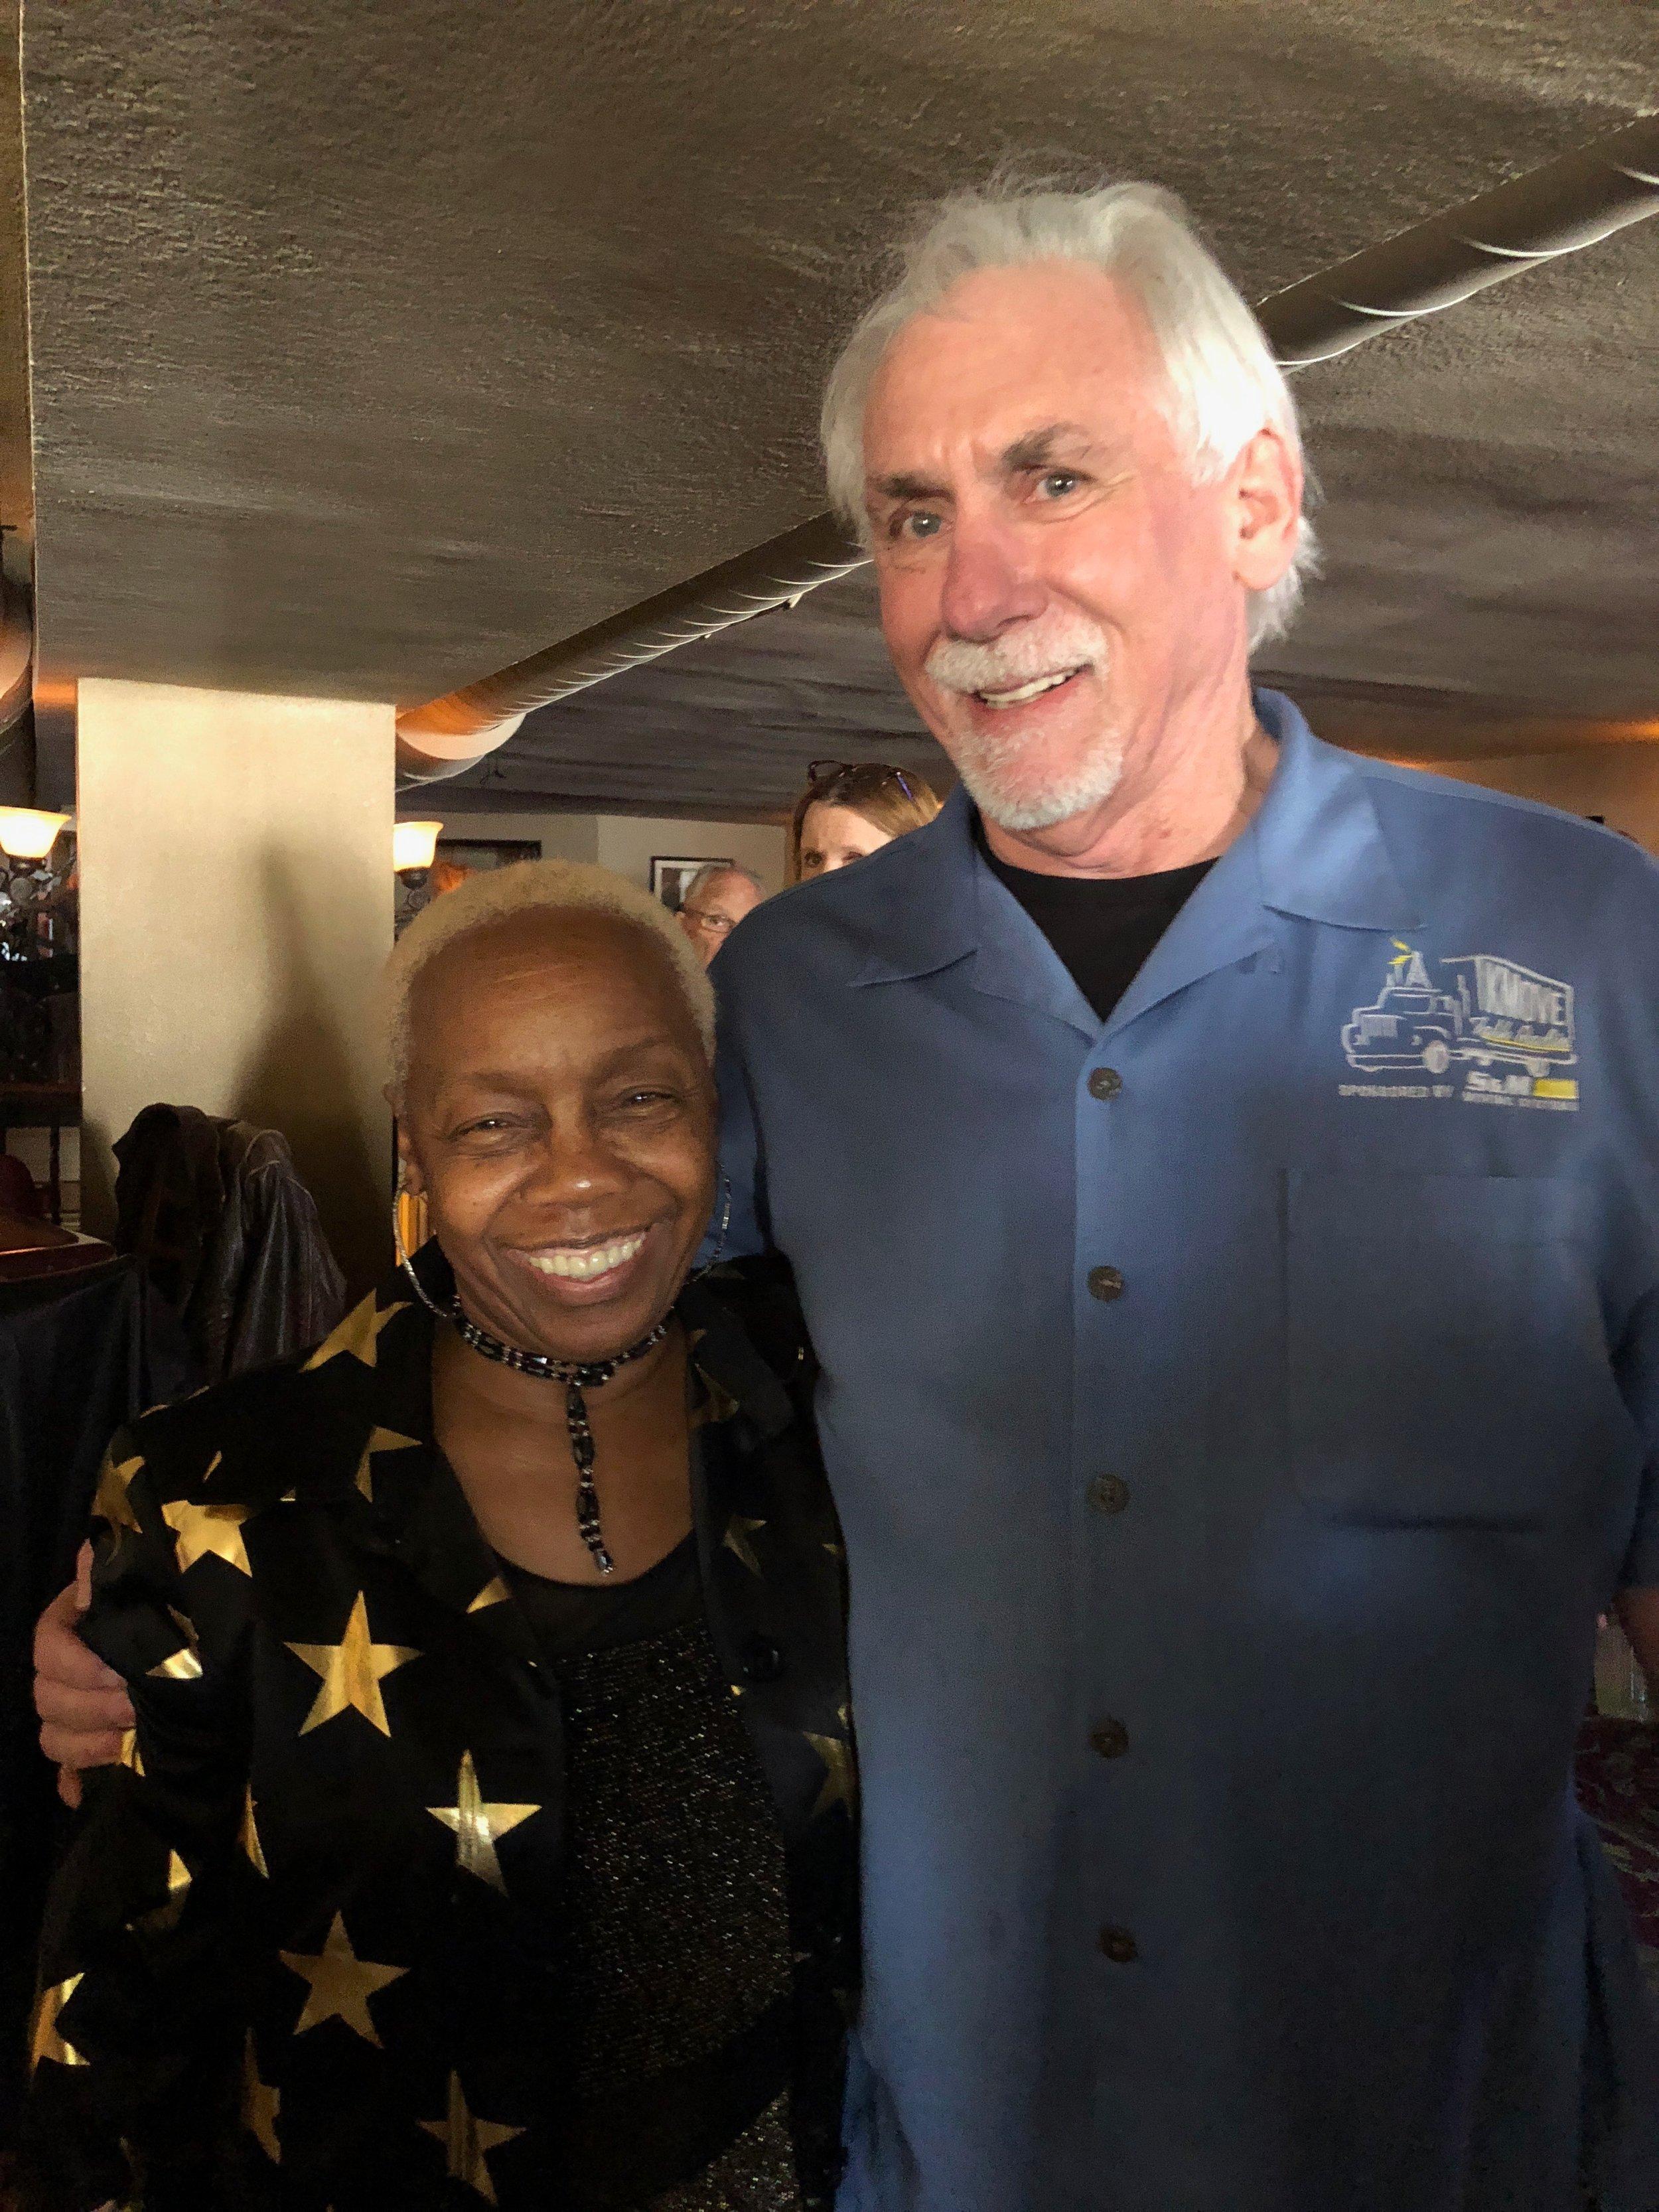 Zakiya Hooker with Clay Goodman of KMOVE Radio